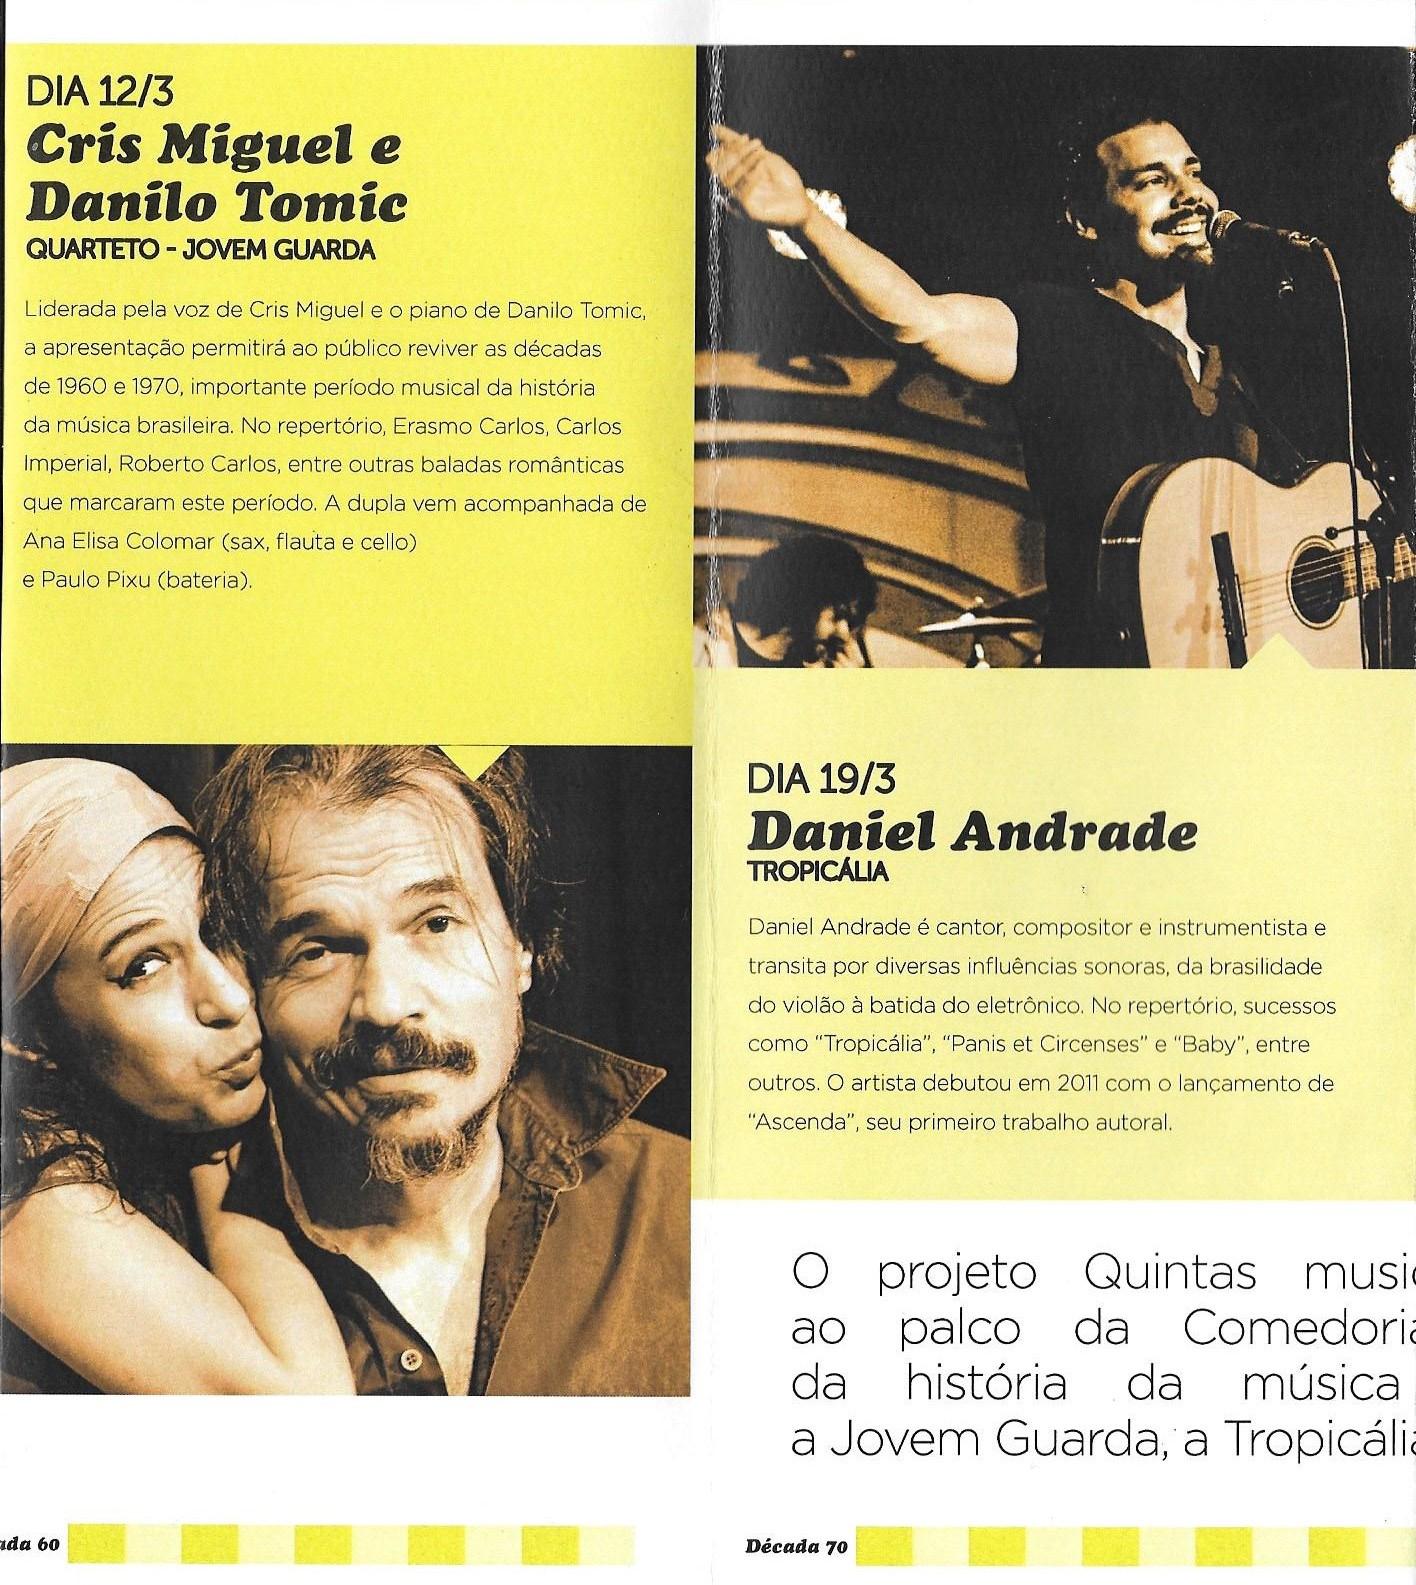 Jovem Guarda e Daniel Andrade